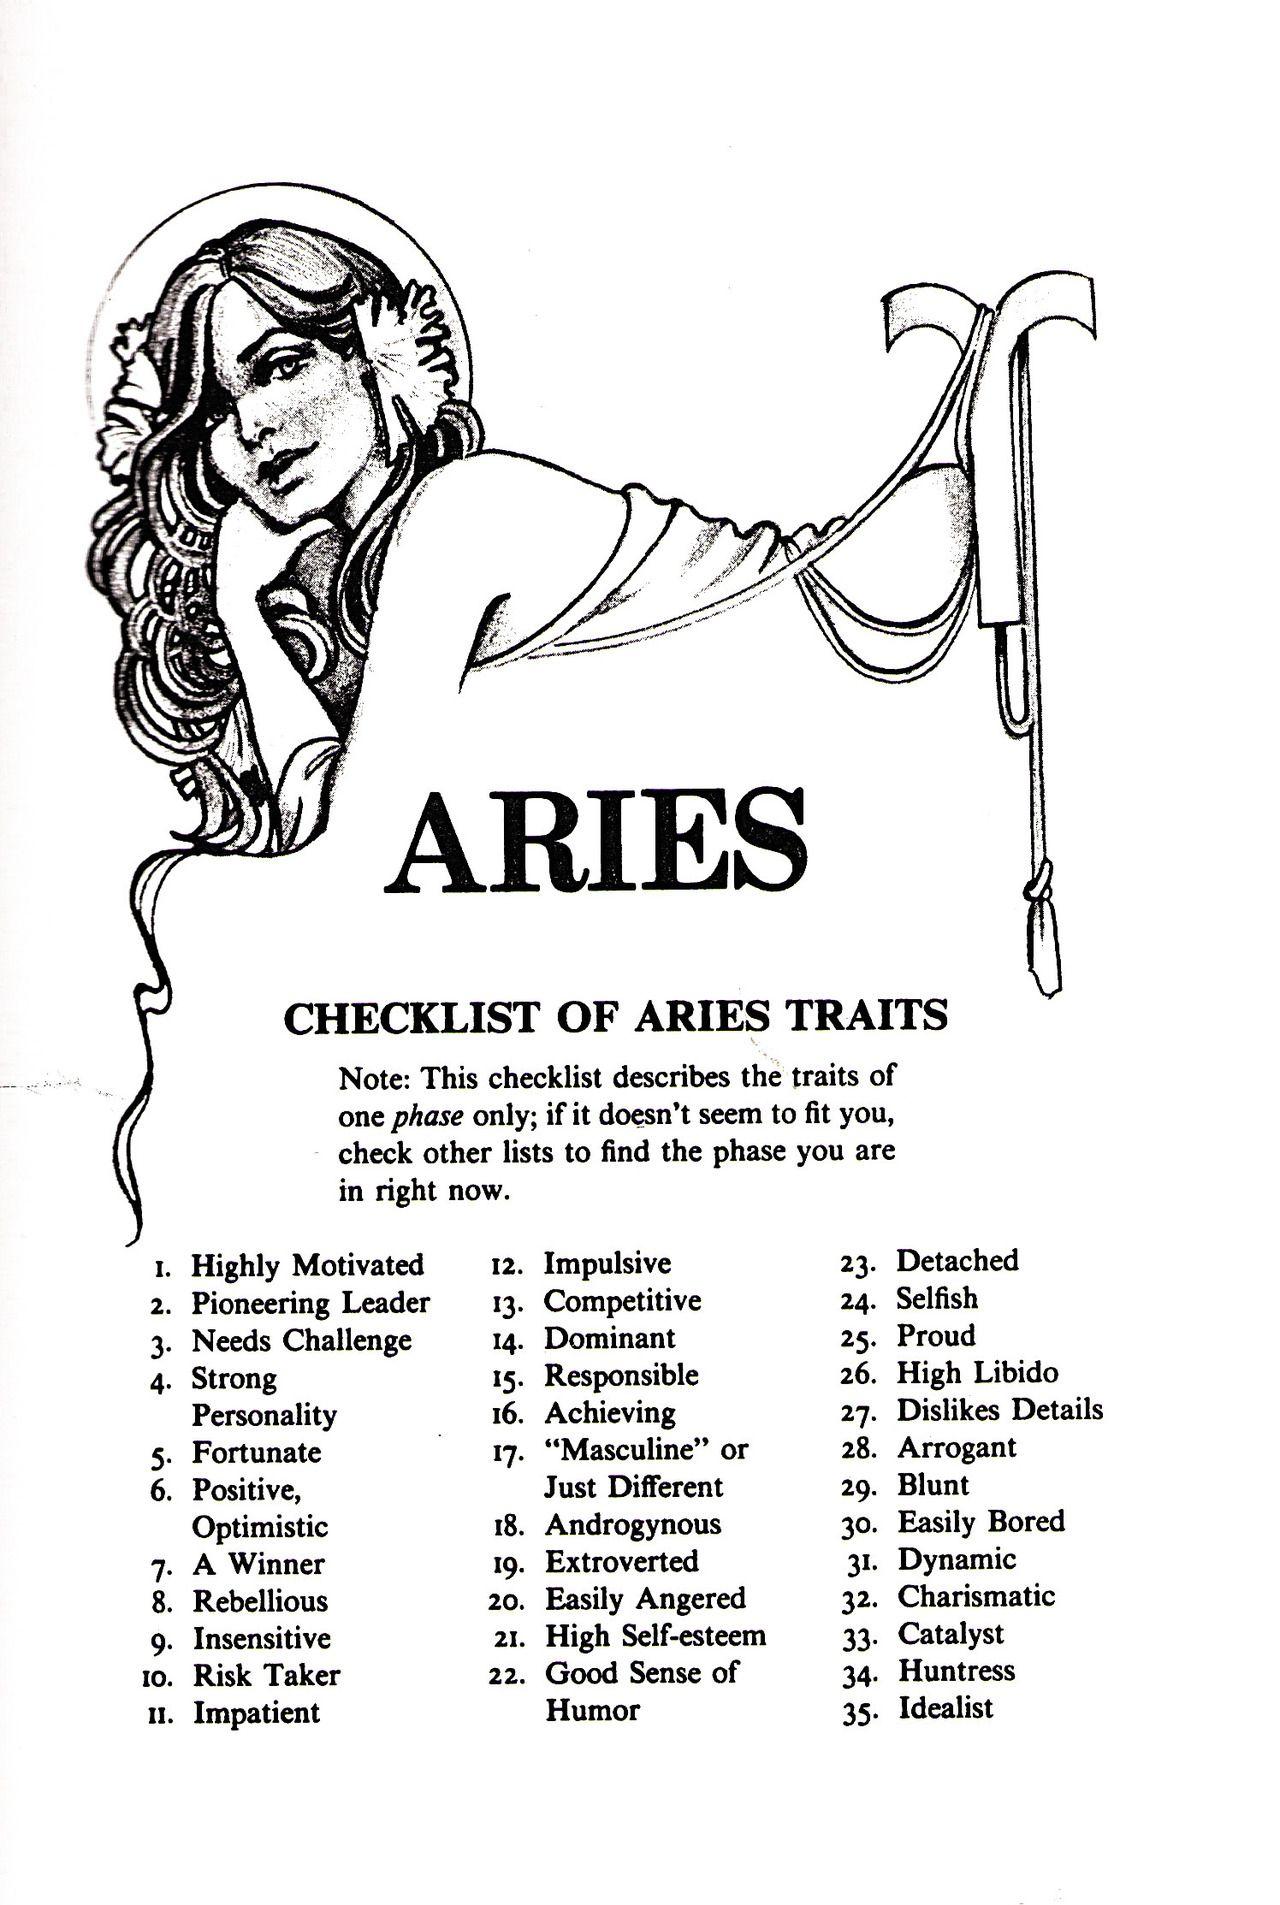 aries zodiac sex facts in Ballarat